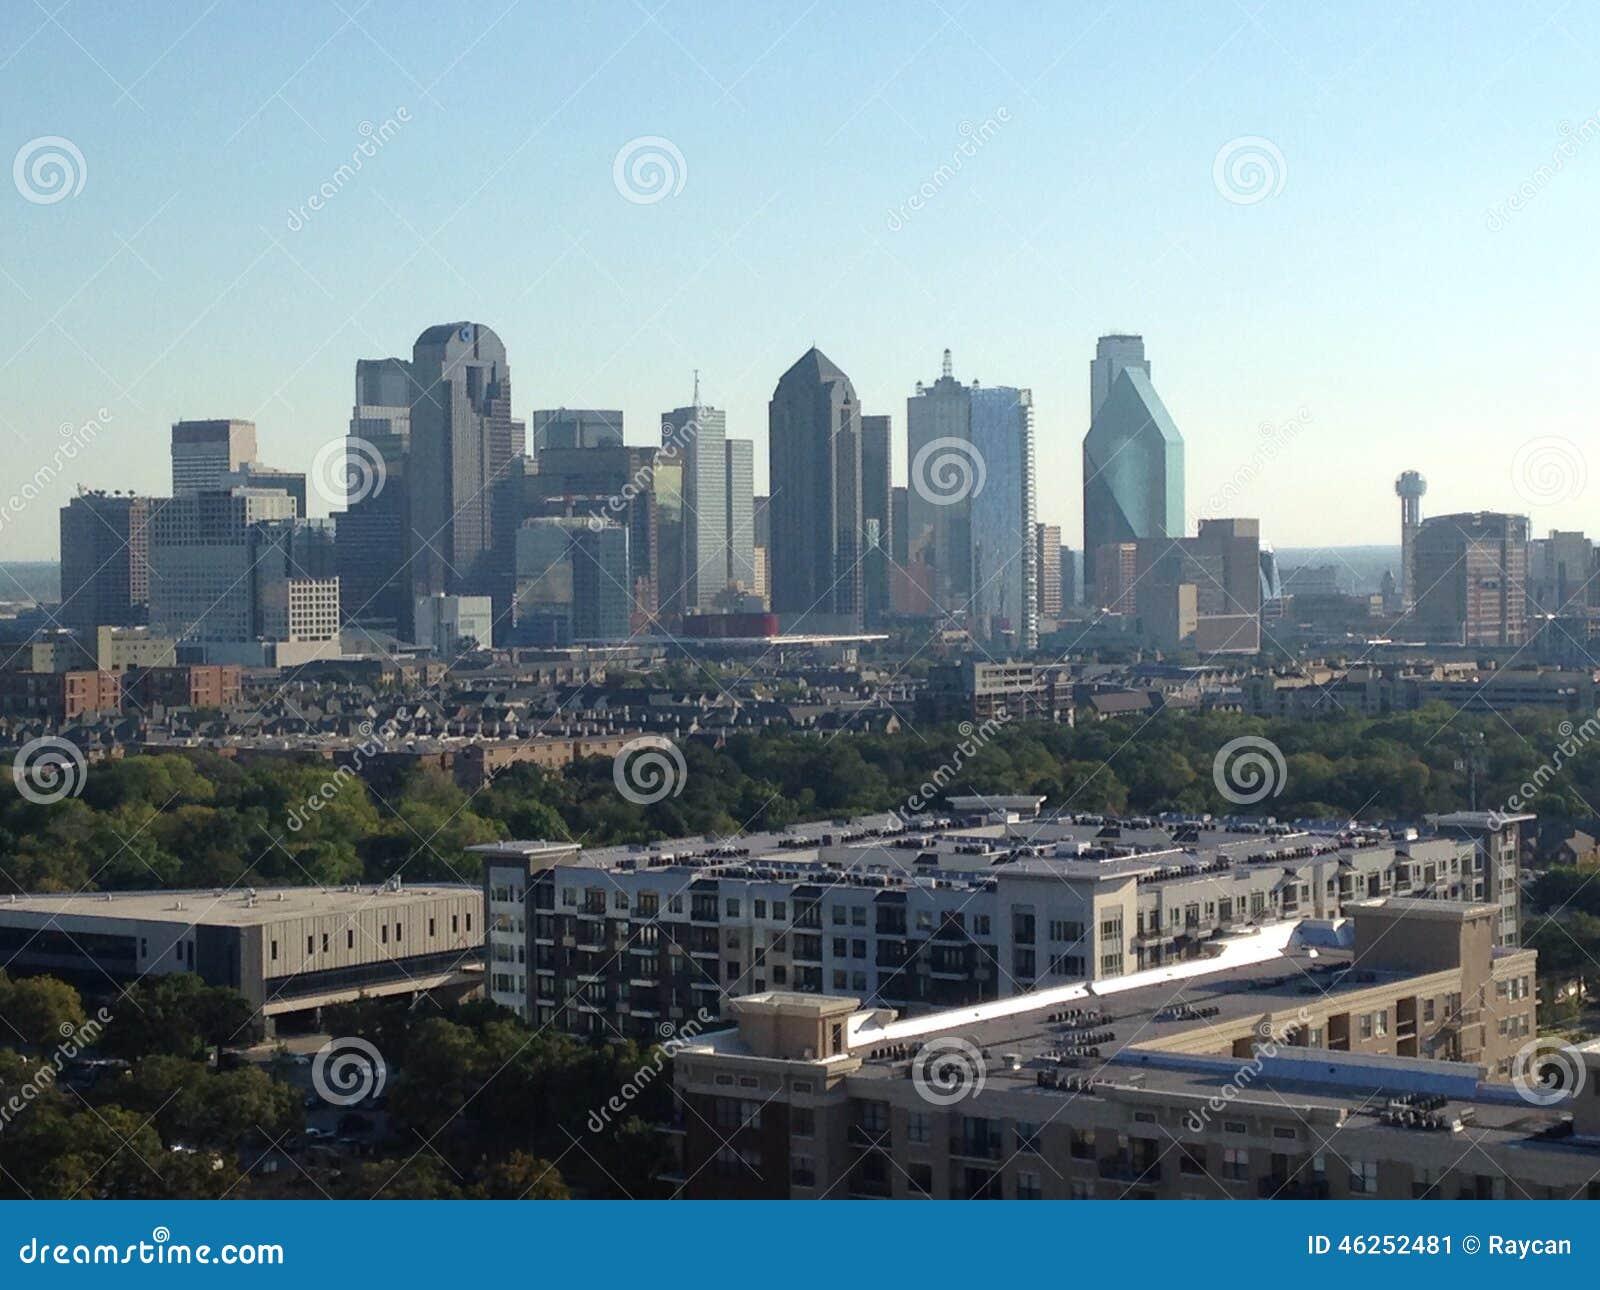 Apartments condo dallas downtown landscape north skyline texas  Skyline Of Dallas  Texas Uptown View Editorial Photo   Image  46252481. Apartments In Downtown Dallas Texas. Home Design Ideas